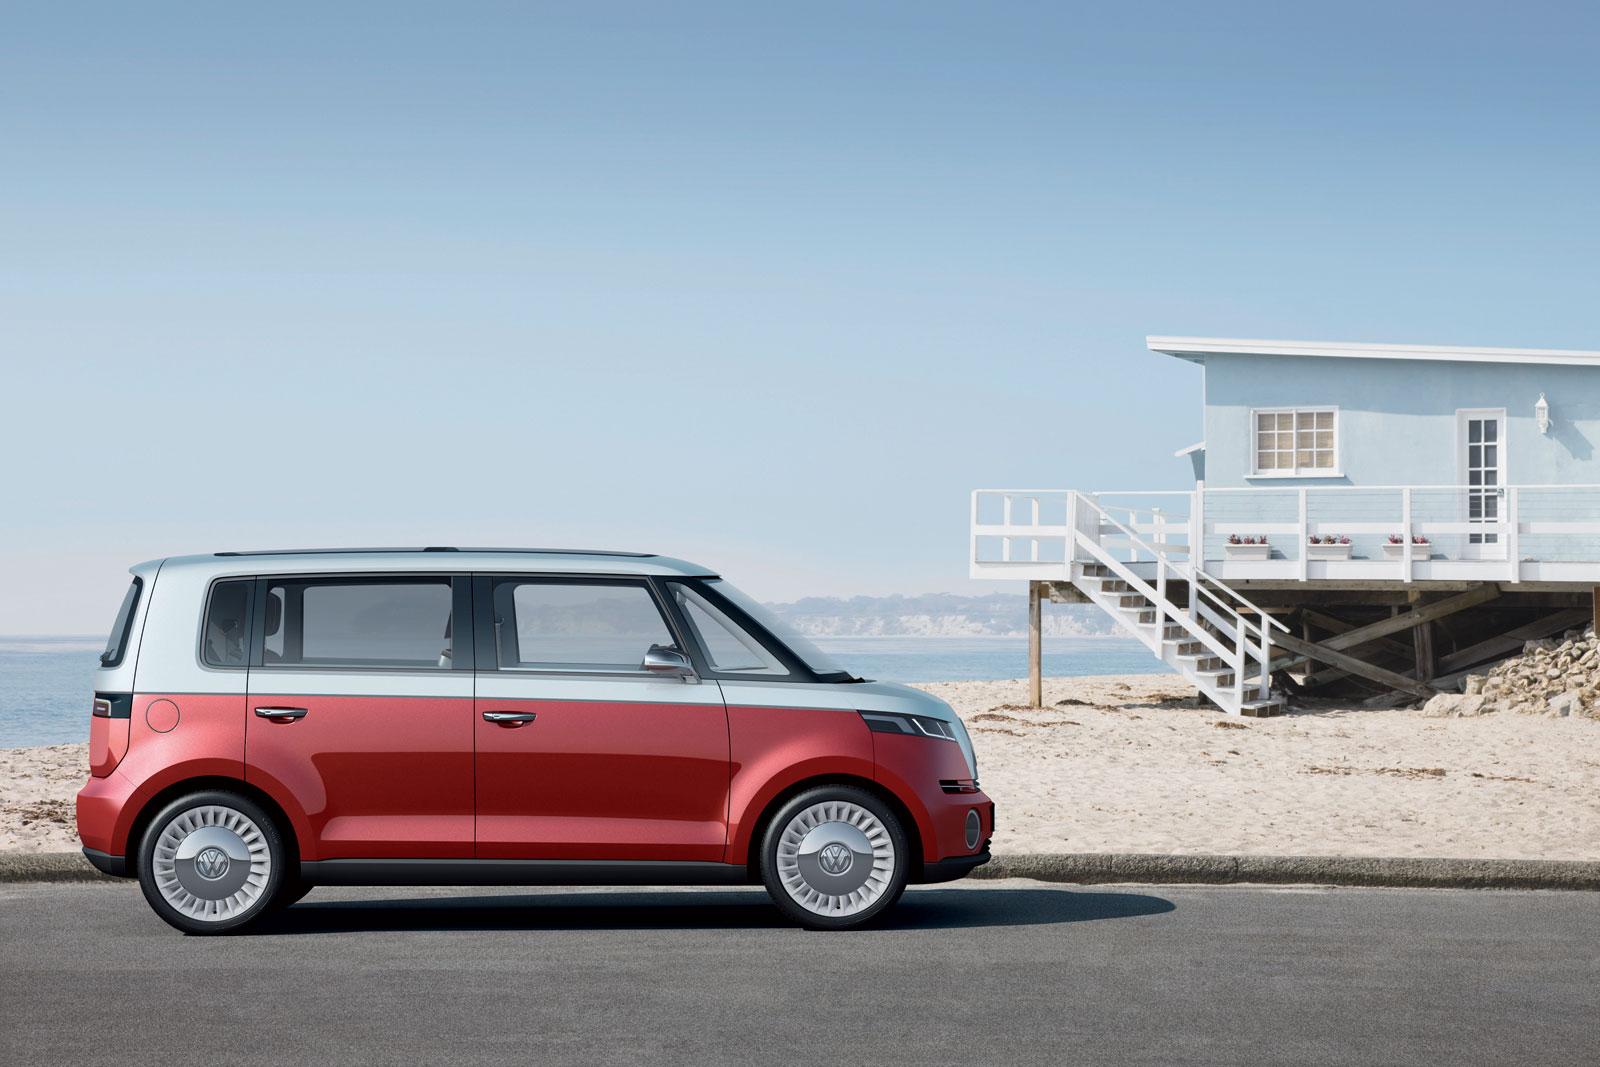 http://1.bp.blogspot.com/-I3eIV9e73PI/T-N6D2XLevI/AAAAAAAAD2M/IcP6uhhaomc/s1600/Volkswagen+Bulli+Concept+Hd+Wallpapers+2011_3.jpg